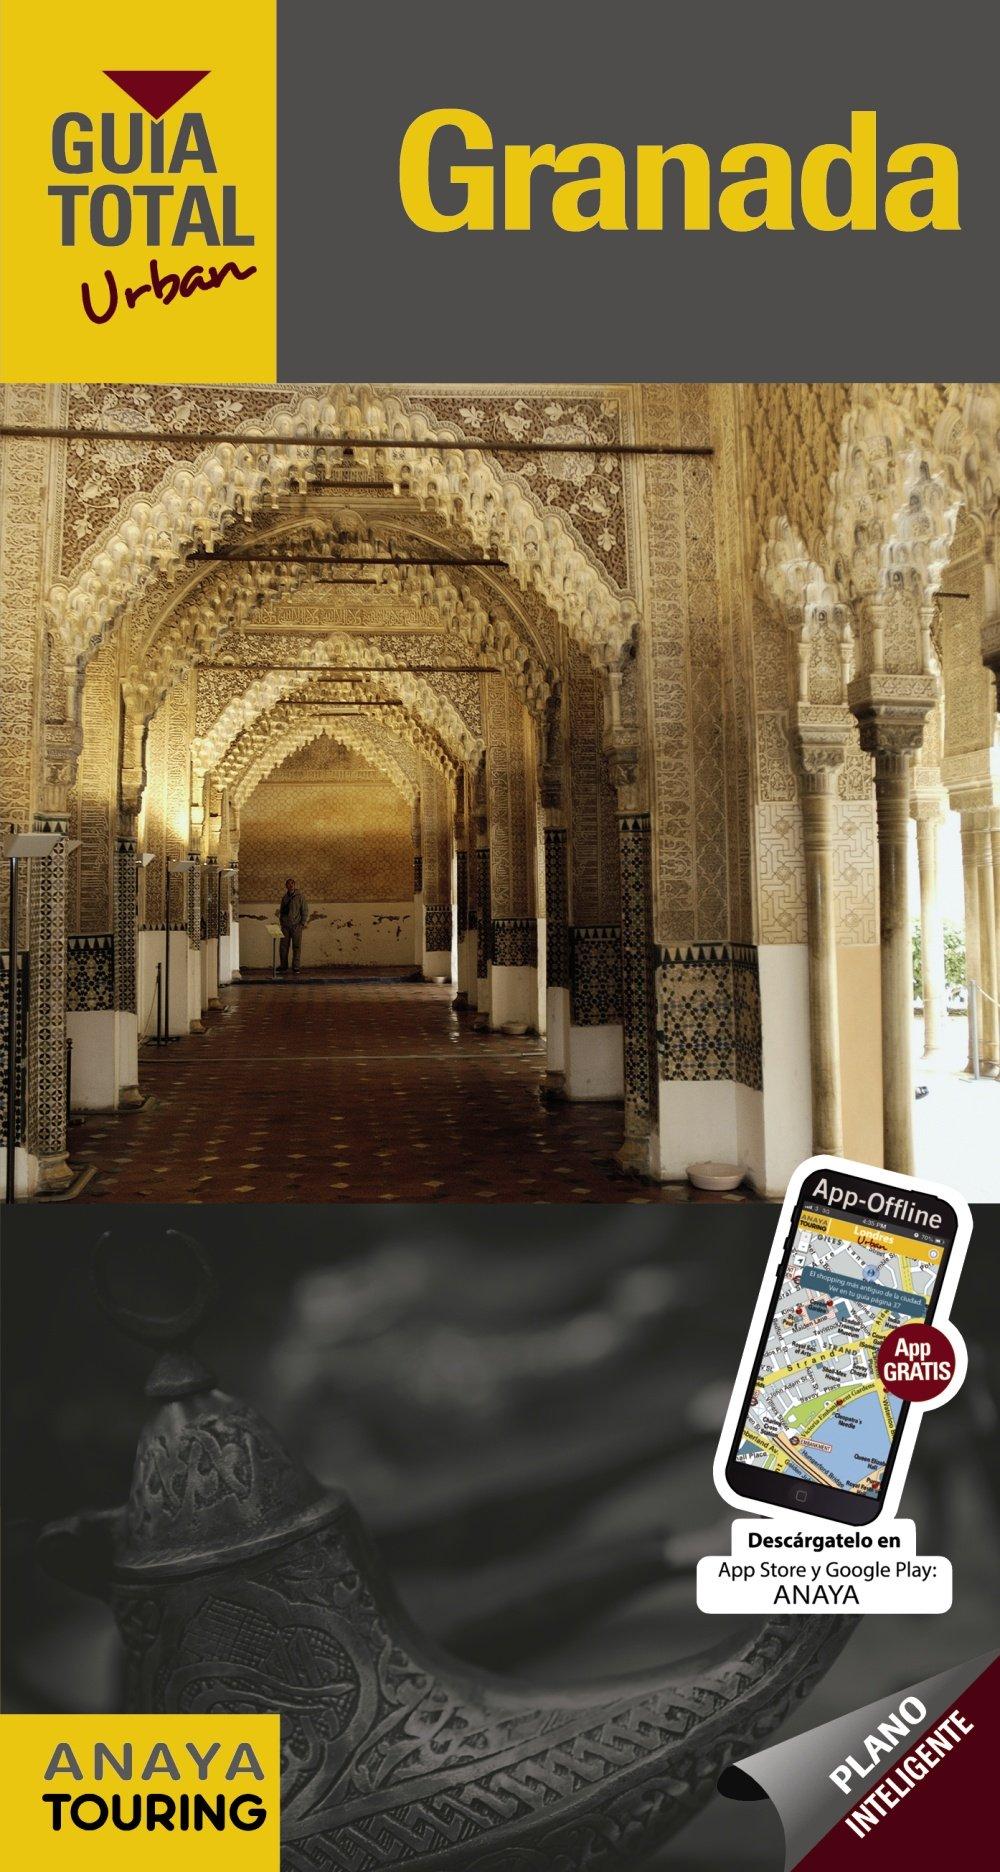 Granada (Urban) (Guía Total - Urban - España): Amazon.es: Anaya Touring, Arjona Molina, Rafael, Wals, Lola: Libros